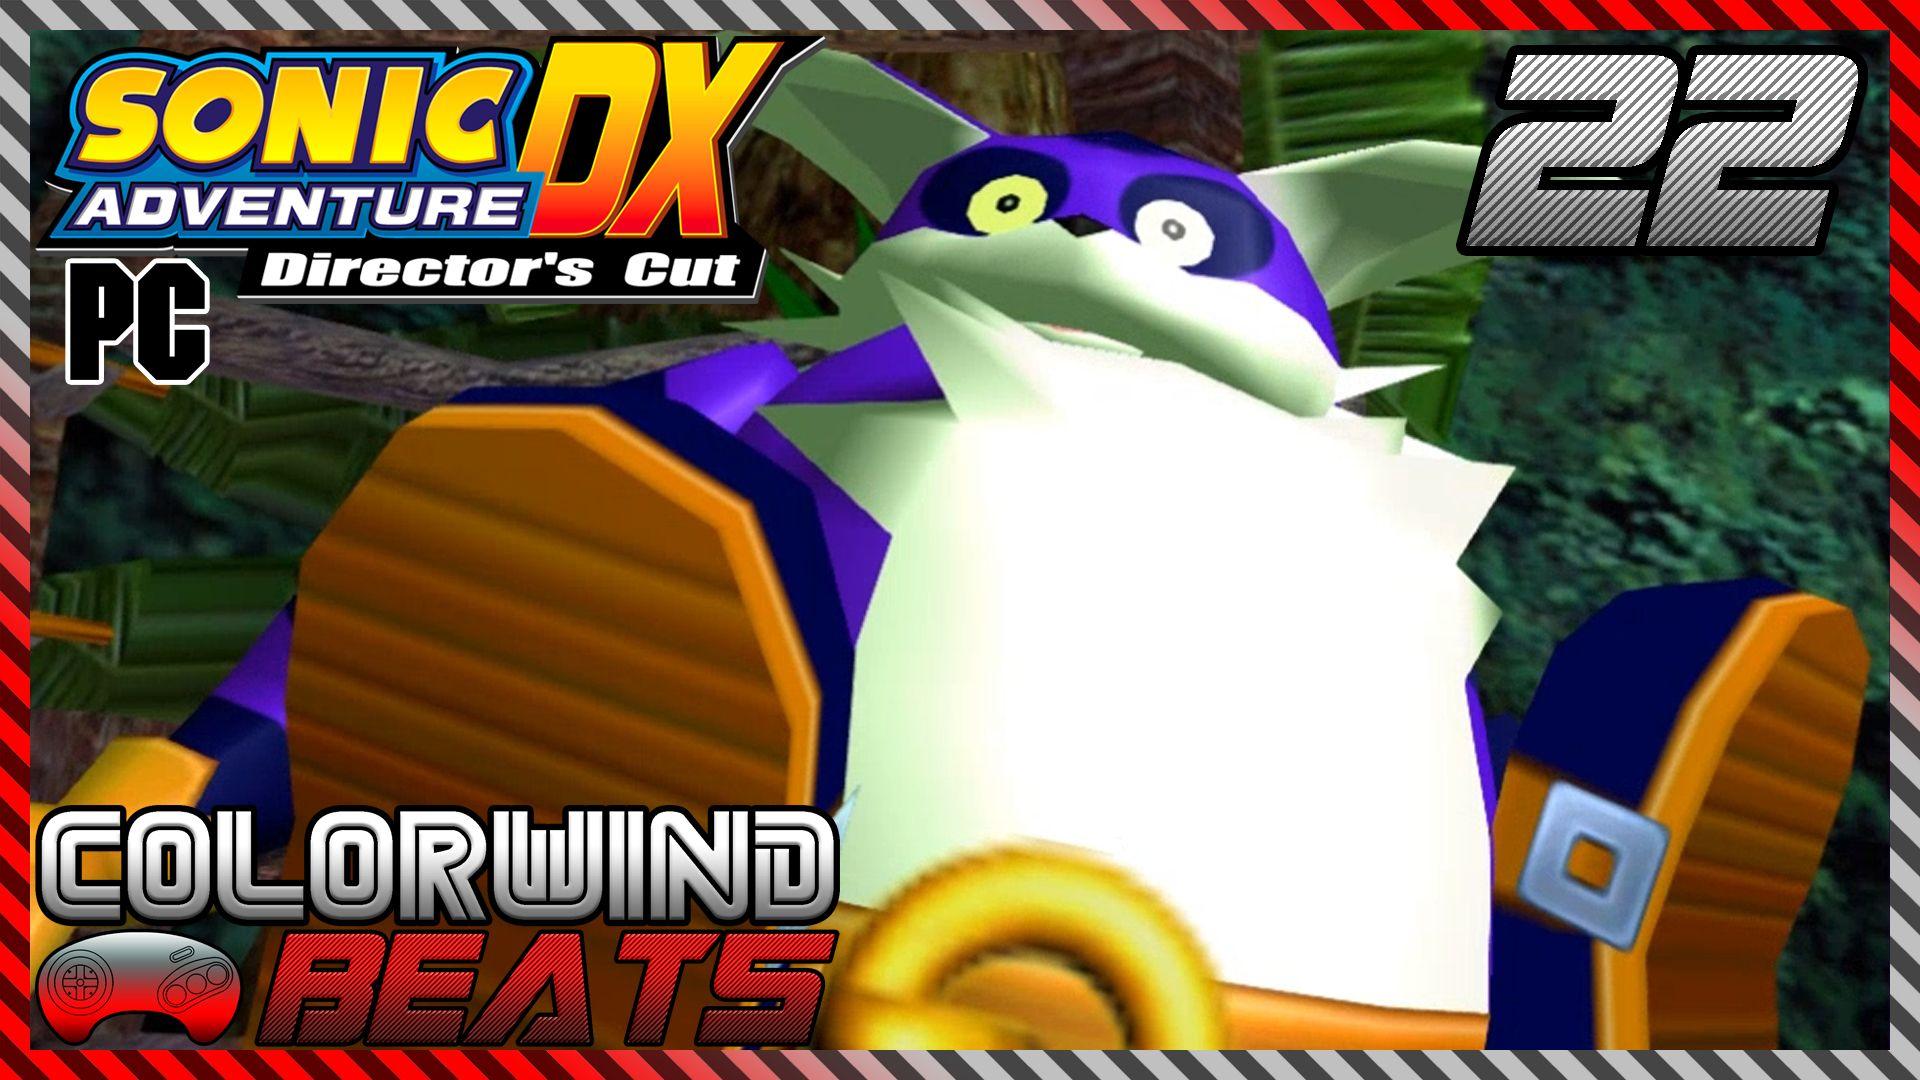 Sonic Adventure DX: Director's Cut (PC) #22